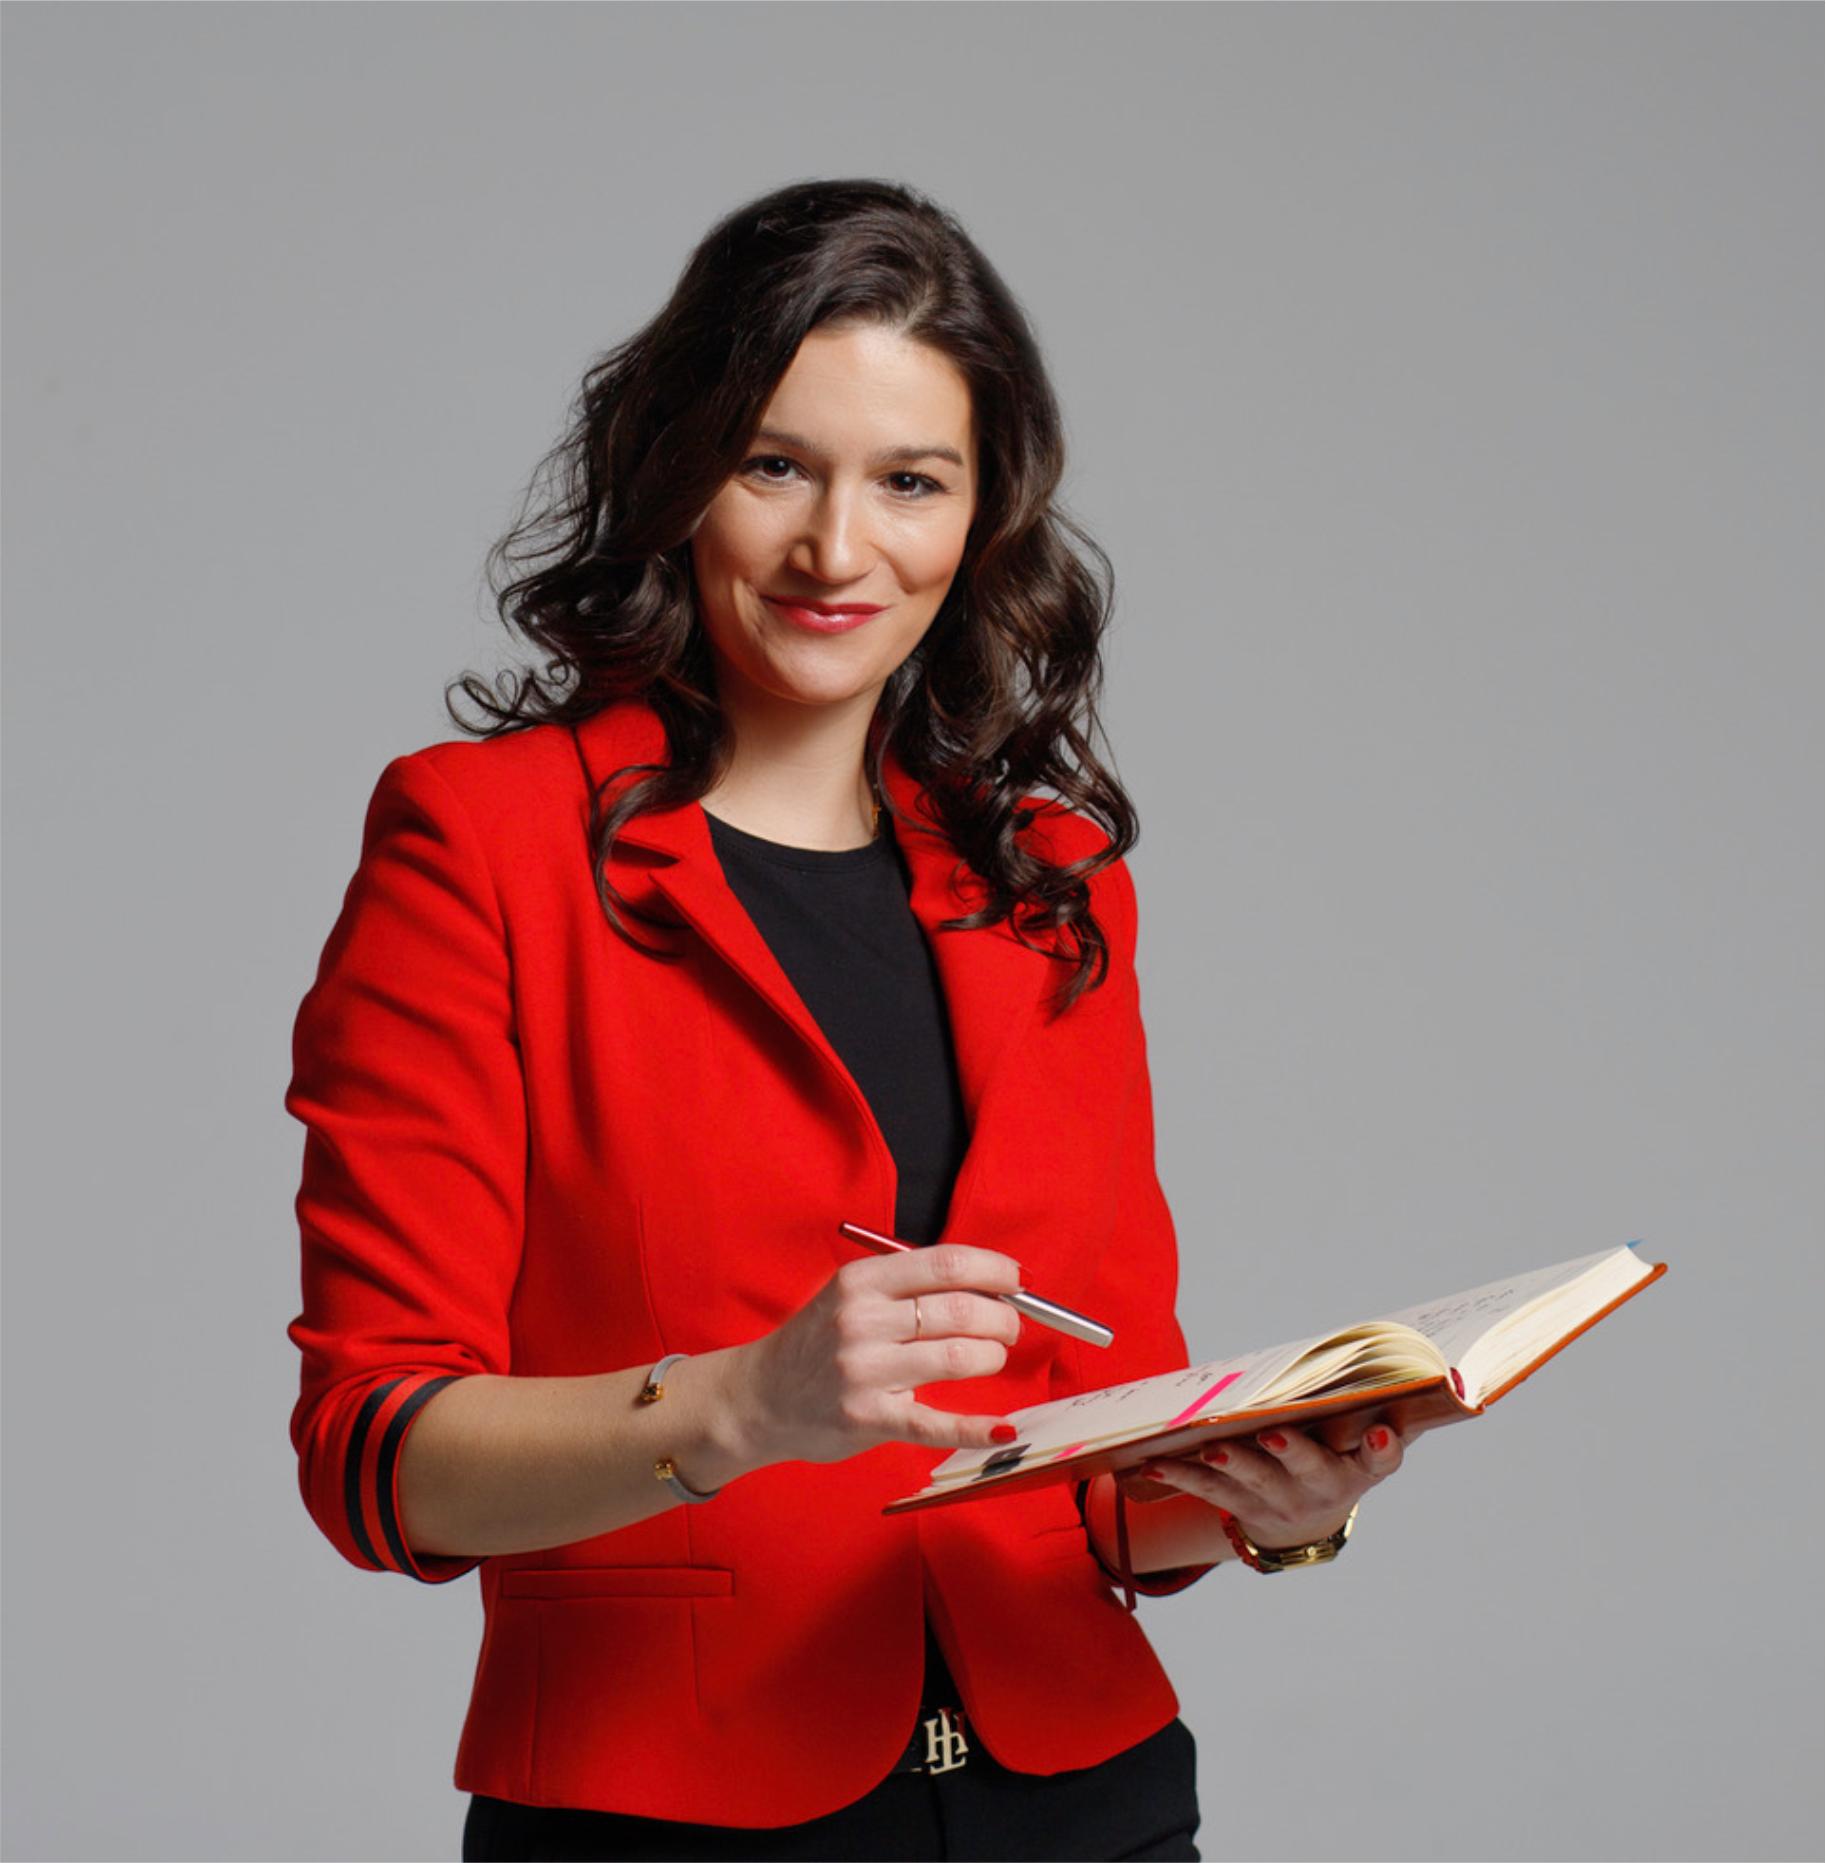 Joanna Zjawin